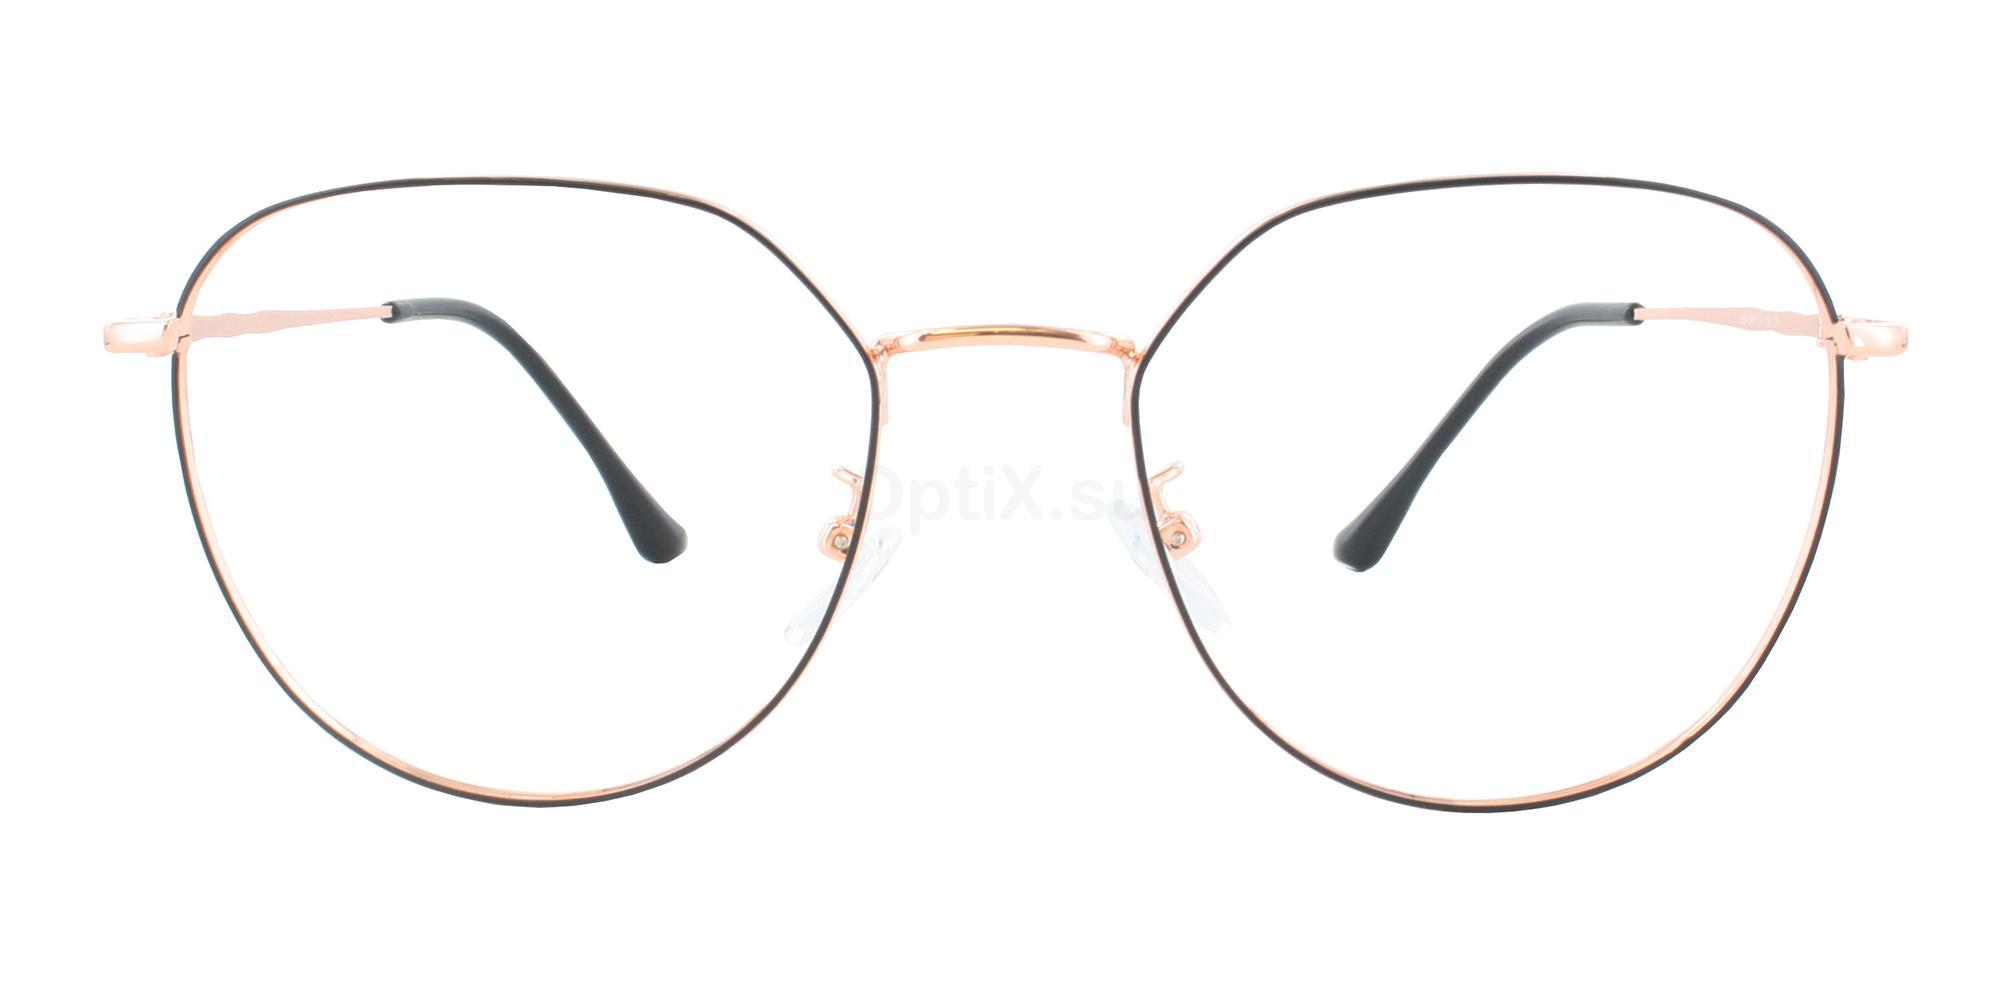 C1 TK1869 Glasses, Infinity